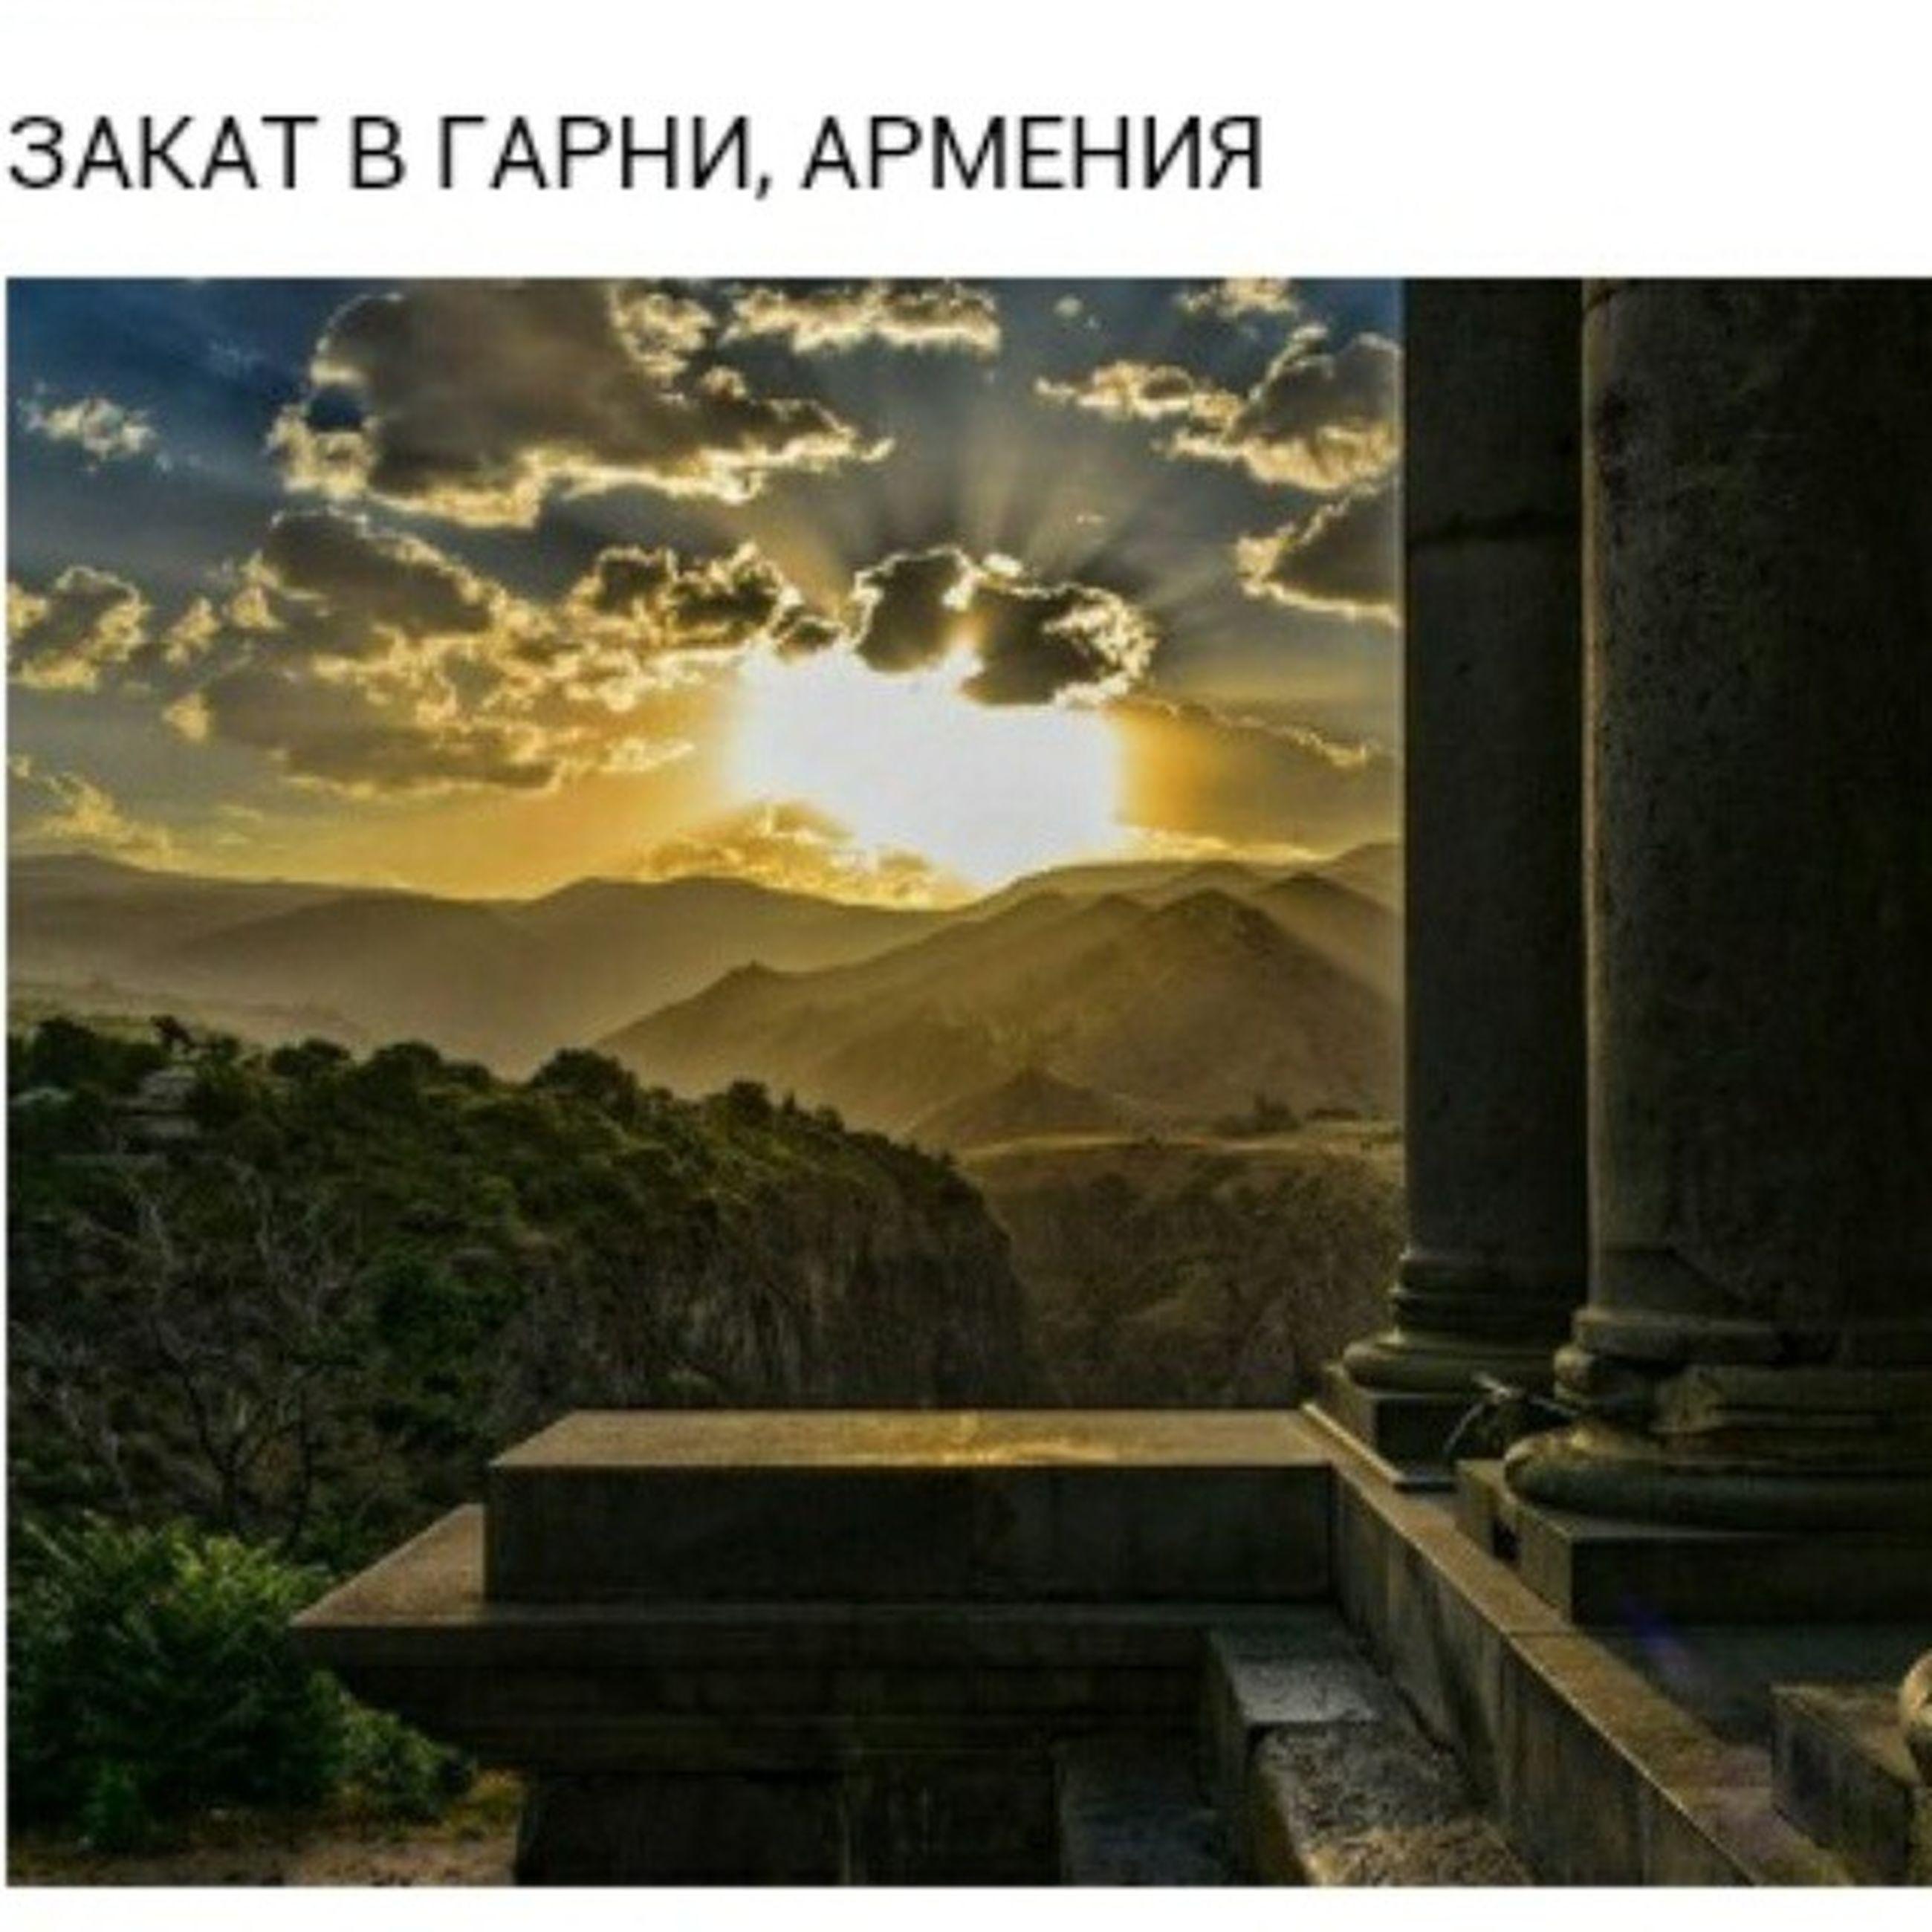 mountain, sky, sunset, mountain range, cloud - sky, scenics, built structure, architecture, tranquility, beauty in nature, tranquil scene, nature, cloud, landscape, sunlight, travel destinations, history, tourism, outdoors, orange color